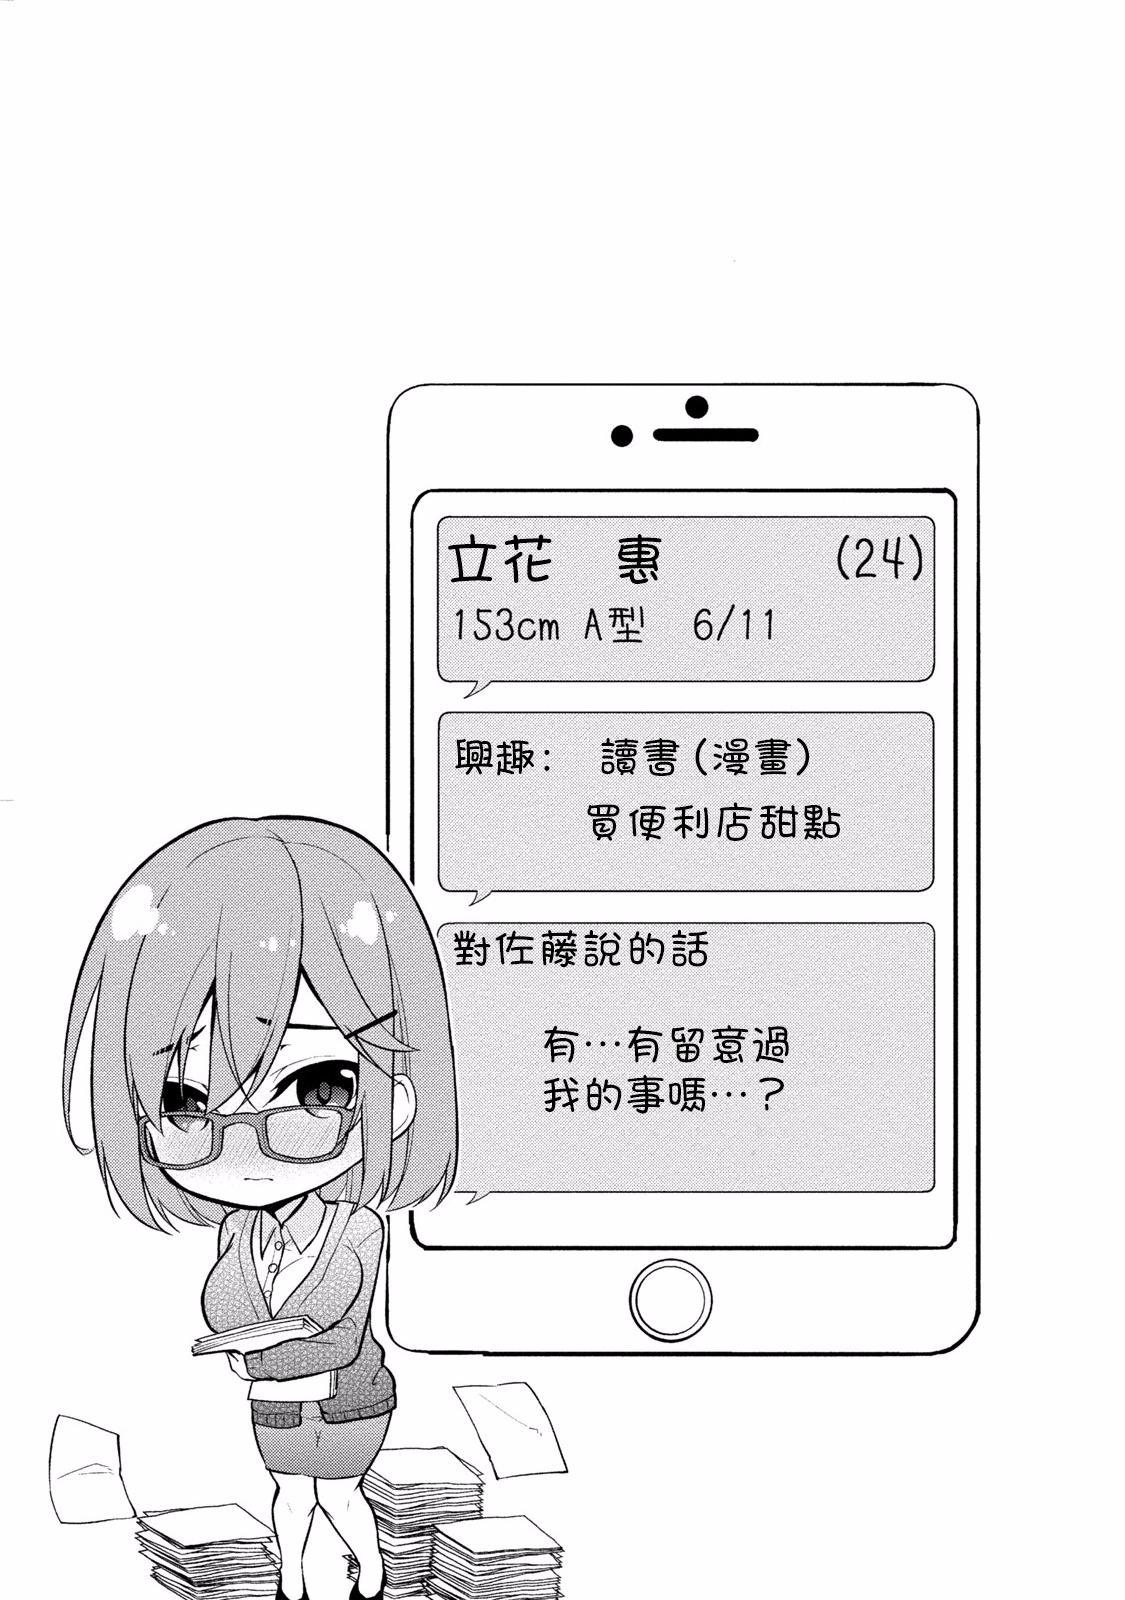 [Yukino] Satou-kun wa Miteiru. ~Kami-sama Appli de Onnanoko no Kokoro o Nozoitara Do XX datta~ Ch. 2 | 佐藤君正在偷窥。~用神大人的APP偷窥女孩子的内心却发现原来是抖XX~02话 [Chinese] [前线作♂战♀基地] 23